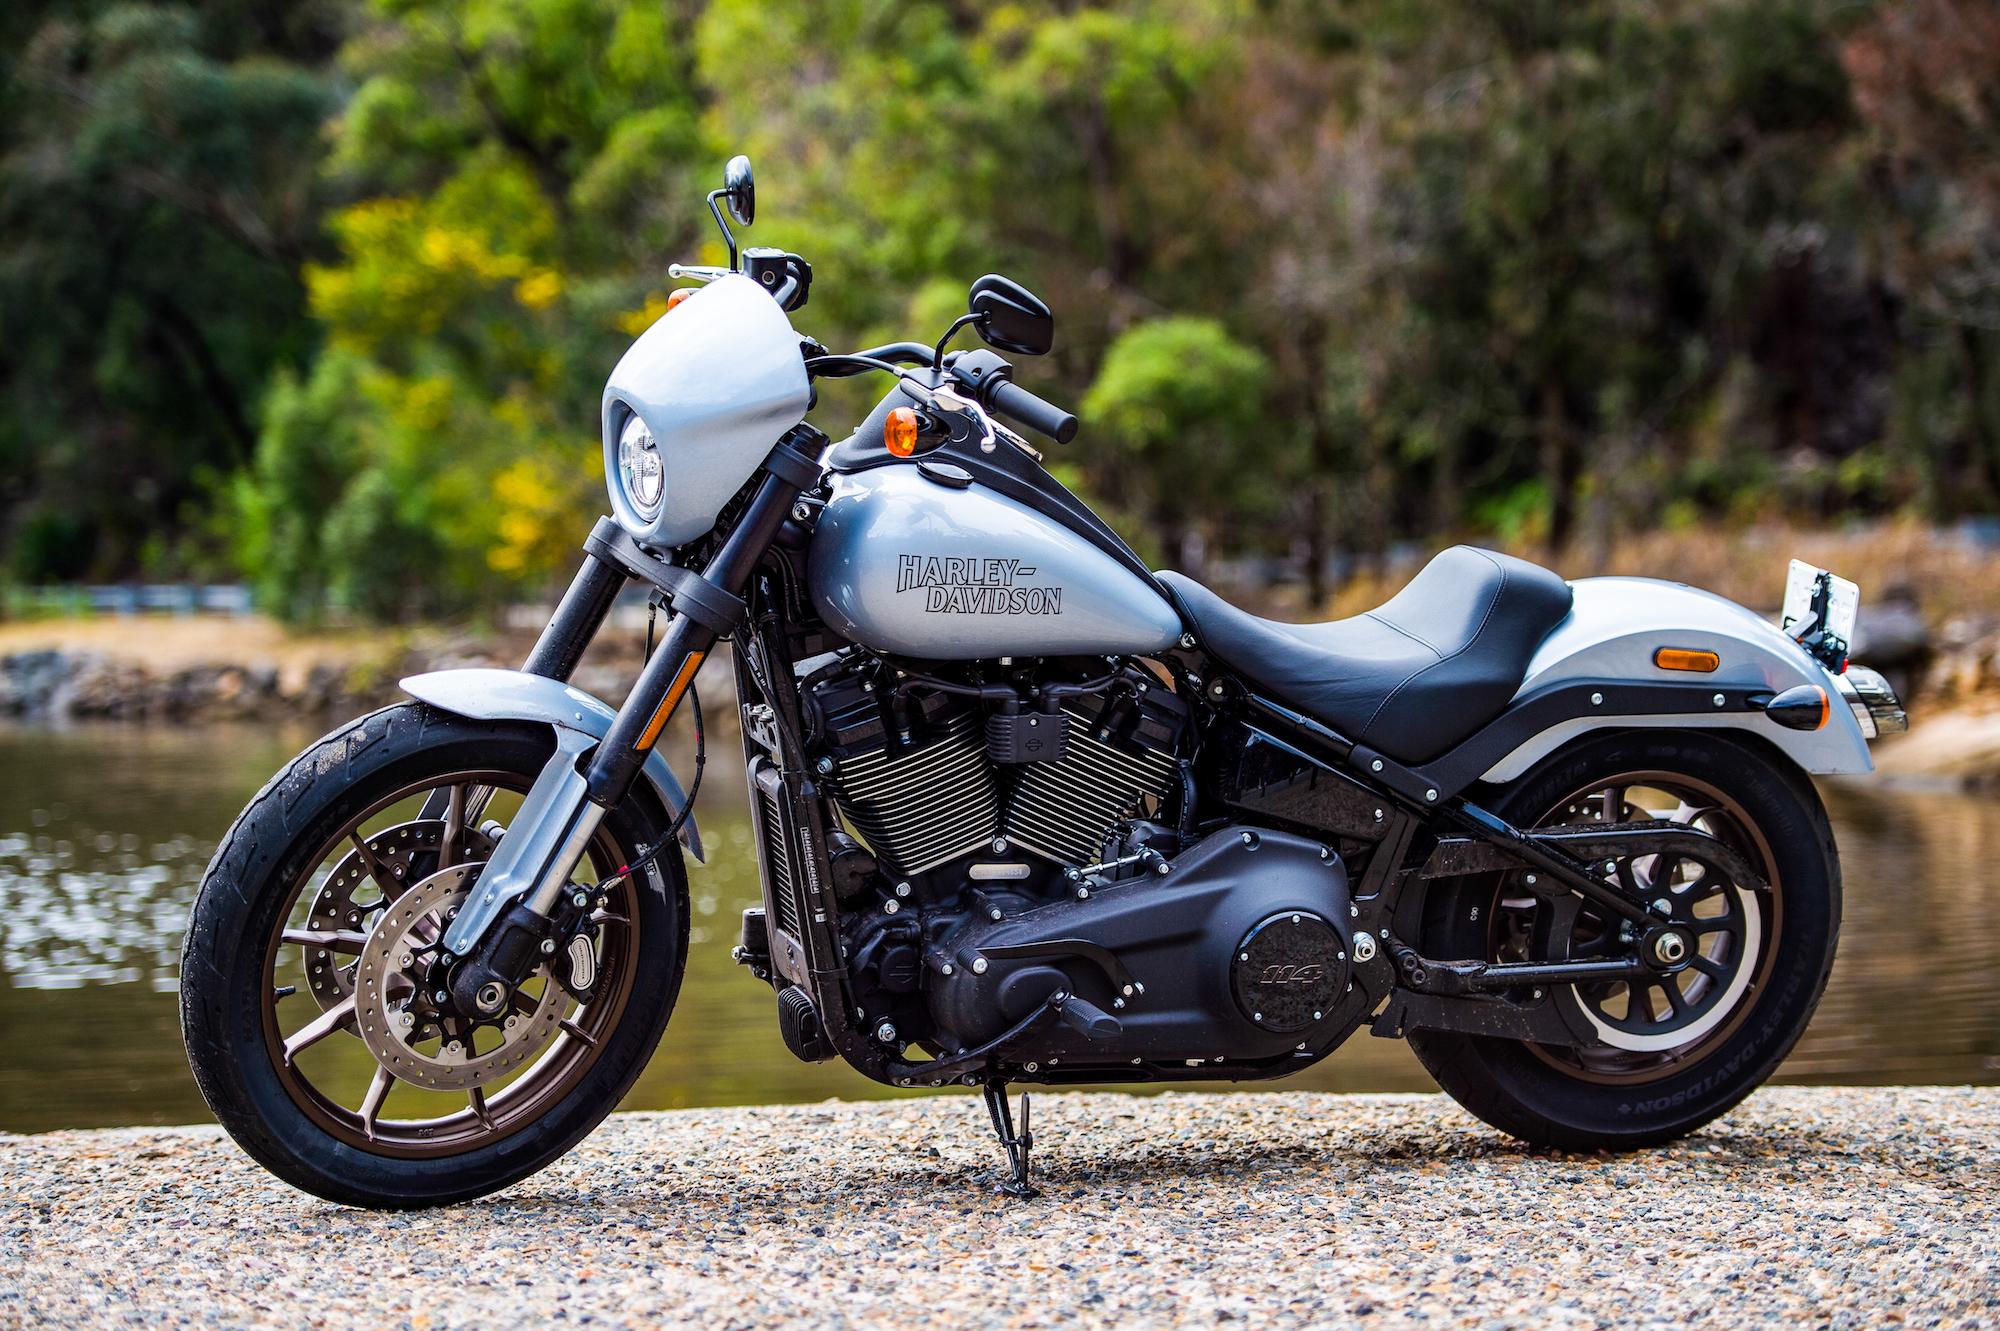 """NEXT LEVEL"" – 2020 Harley-Davidson Low Rider S | Bike ..."